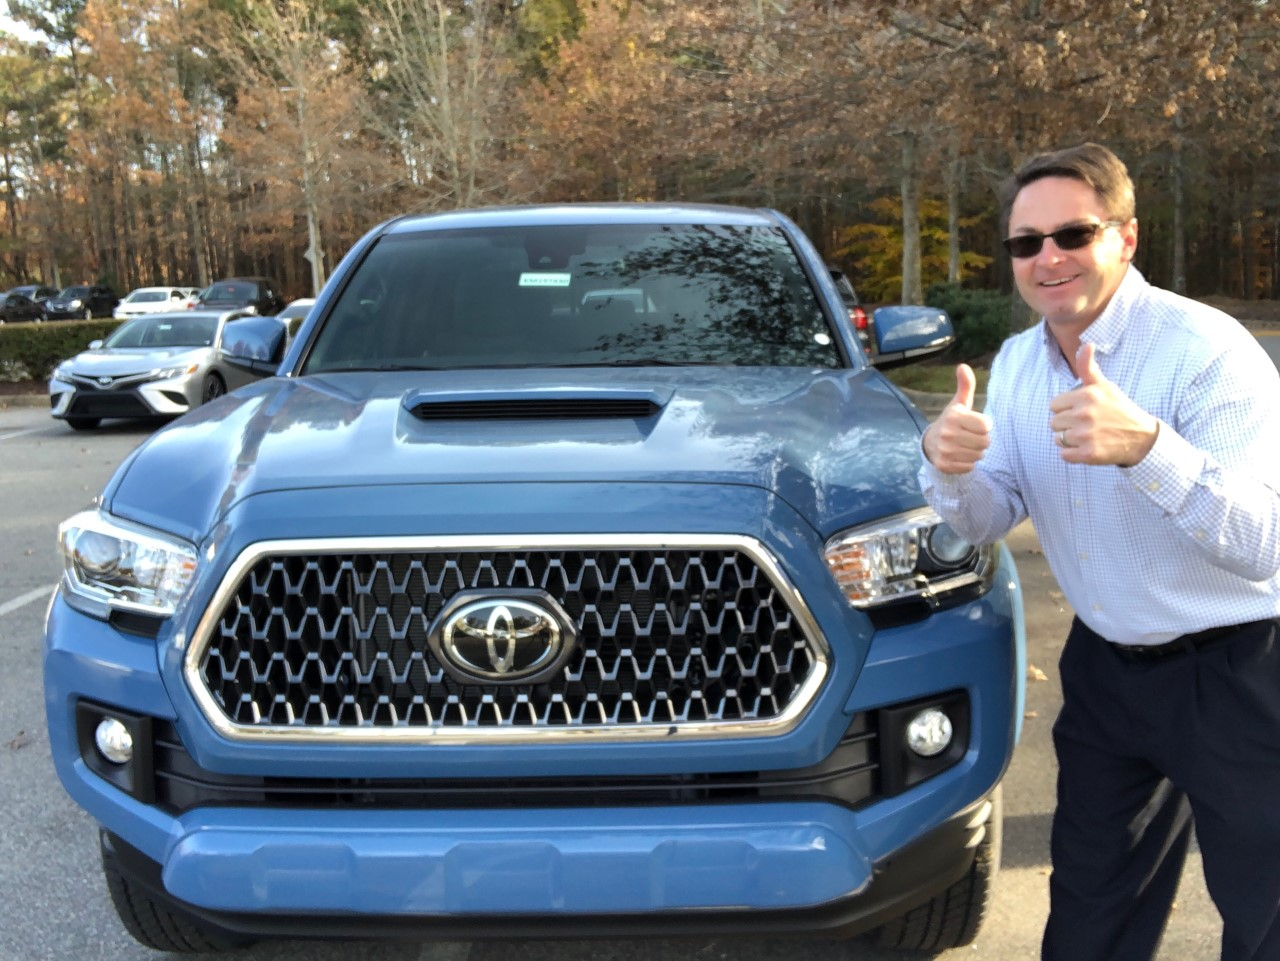 Toyota Jeff next to a tacoma